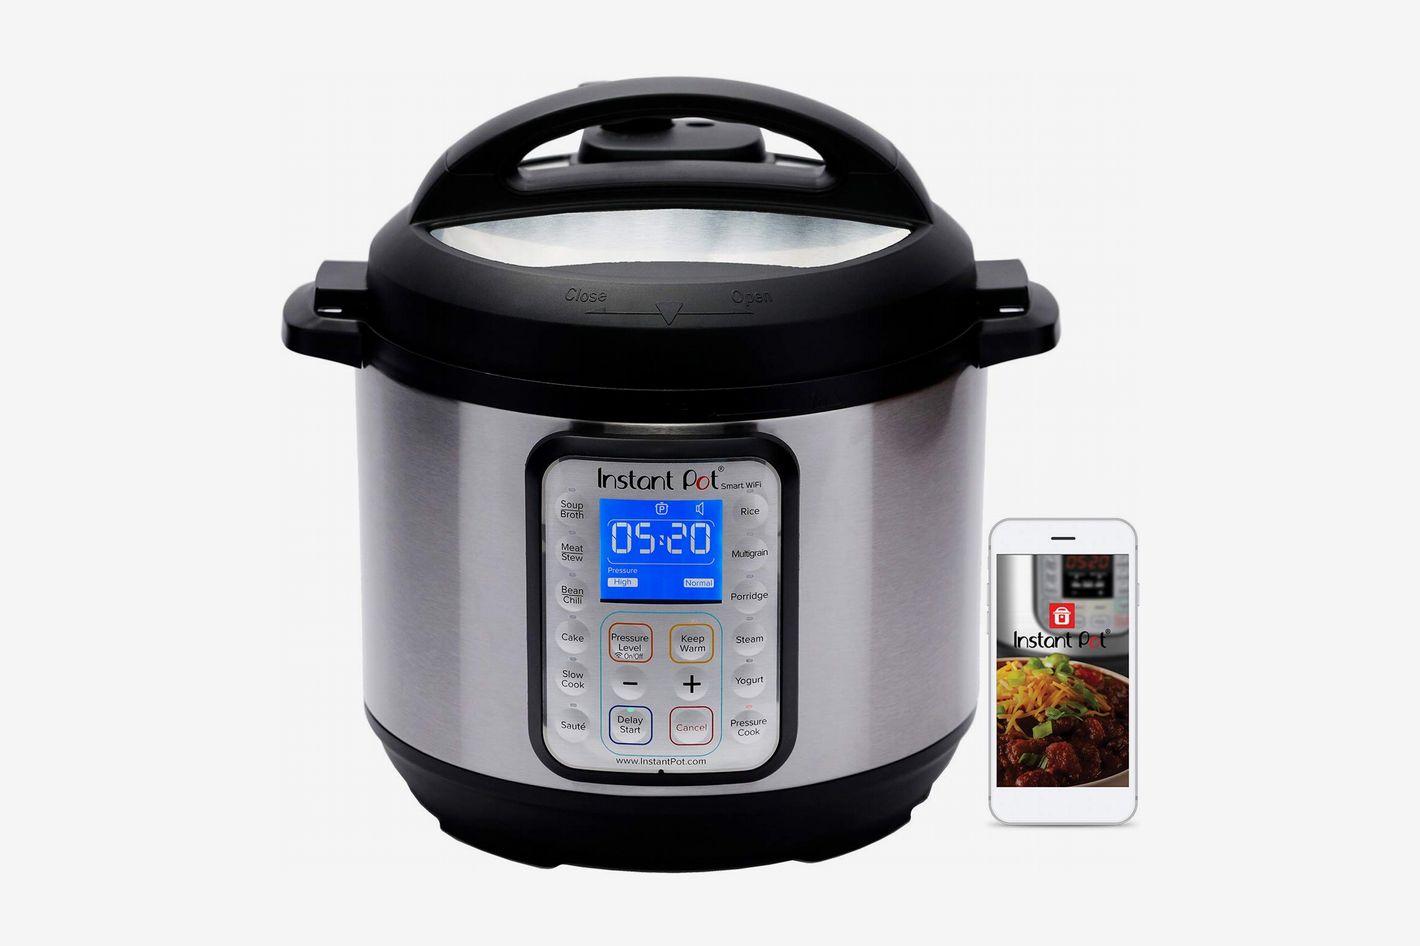 Instant Pot Smart WiFi 6-Quart Multi-Use Electric Pressure Cooker